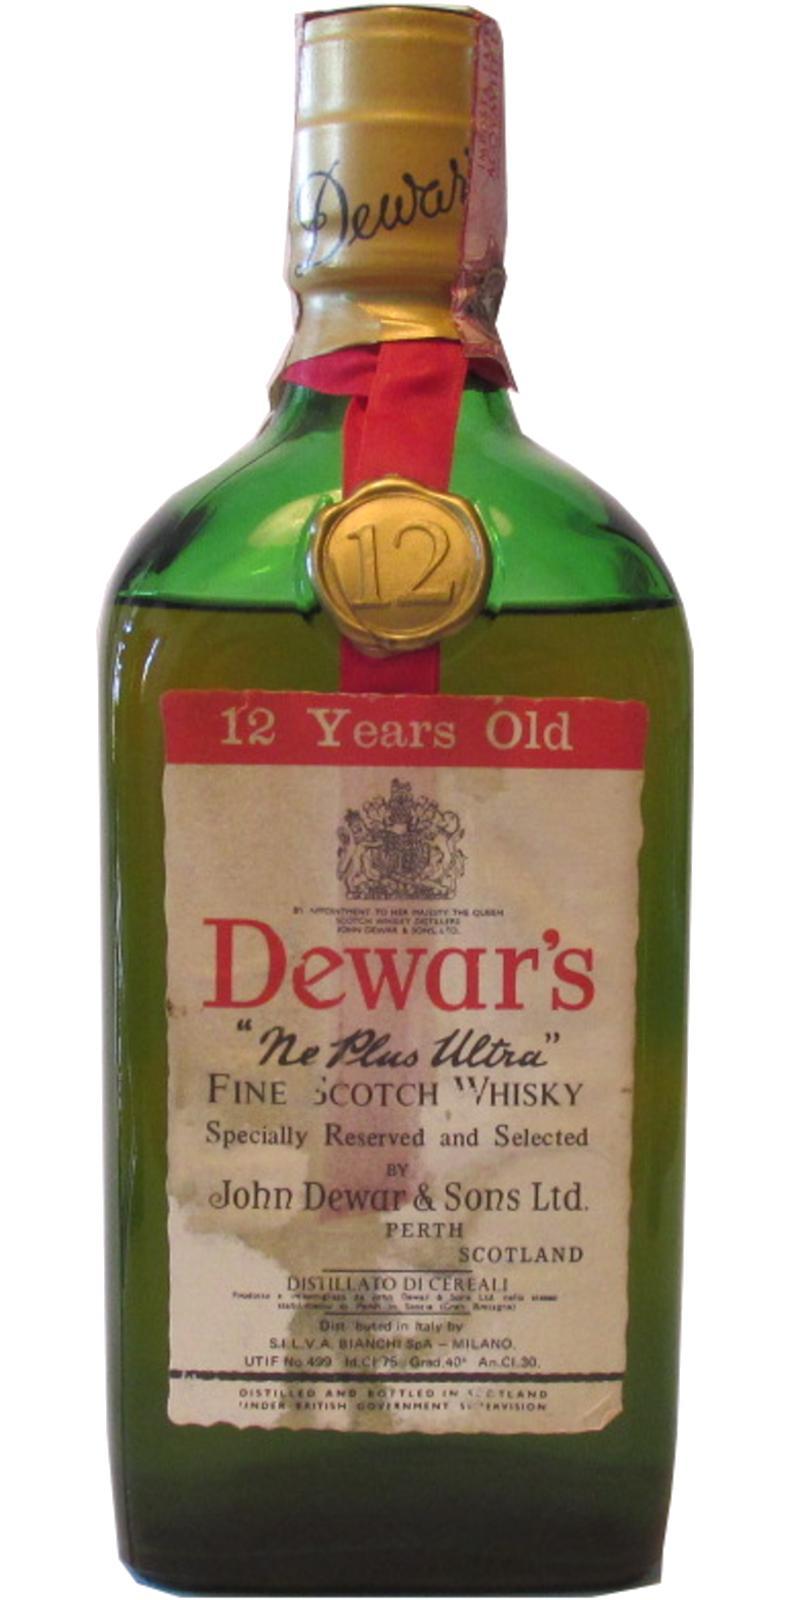 Dewar's Ne Plus Ultra